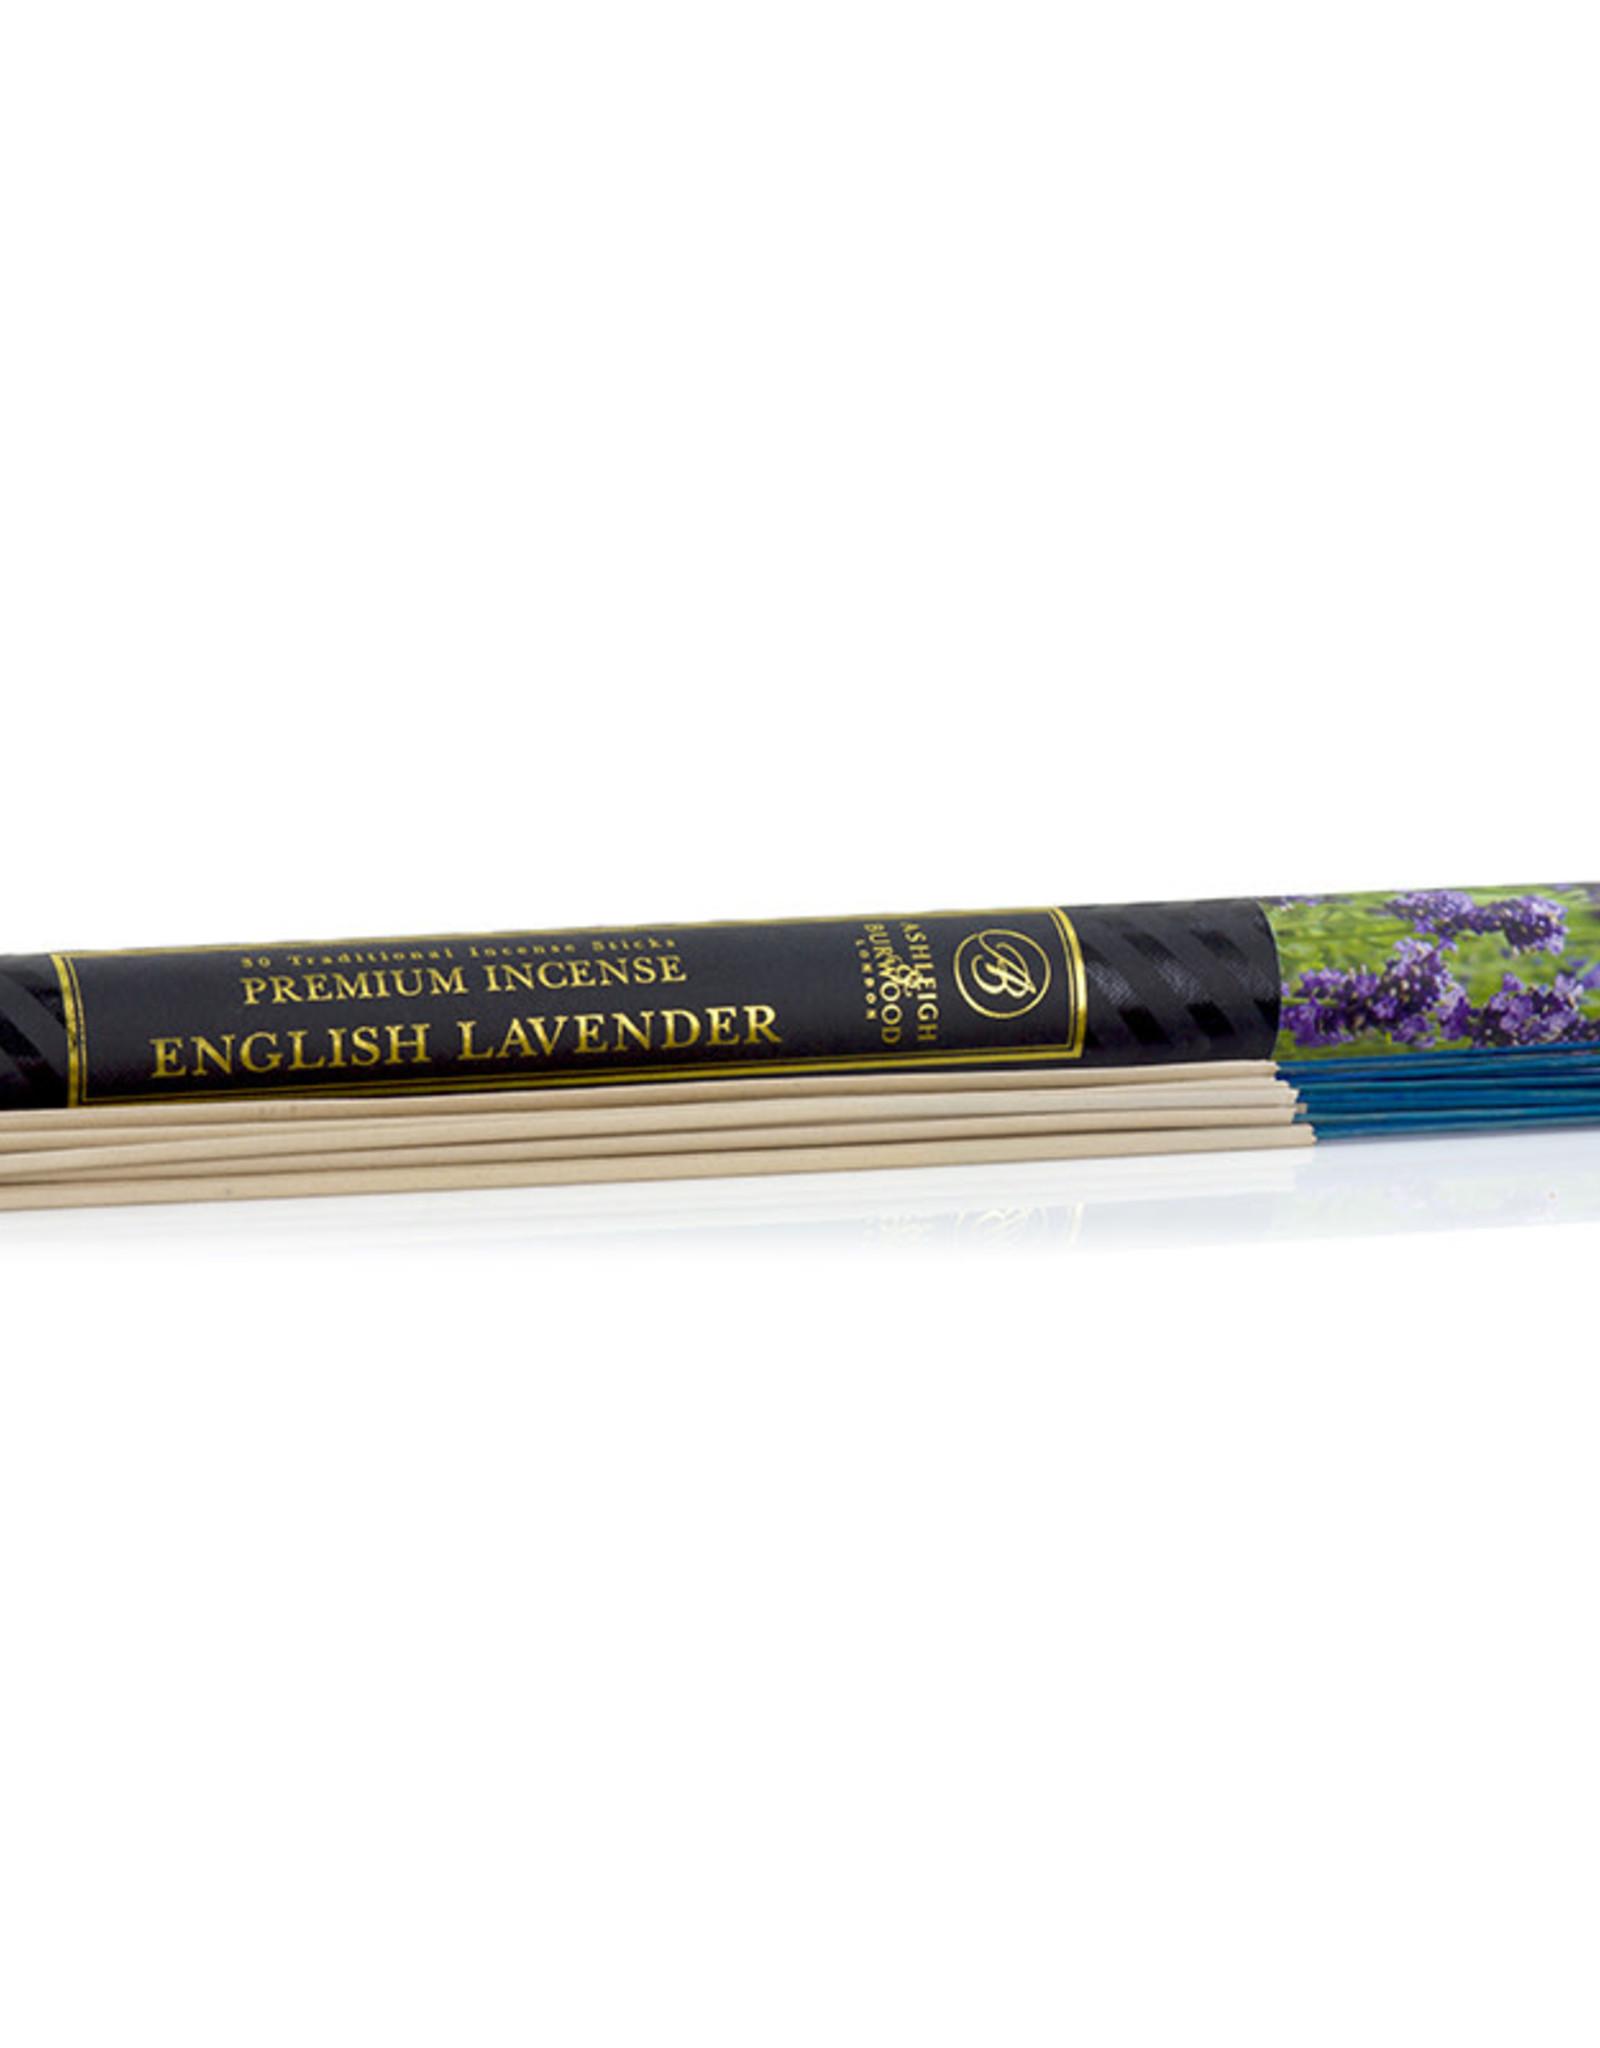 Ashleigh & Burwood Wierook English Lavender Incense - Ashleigh & Burwood